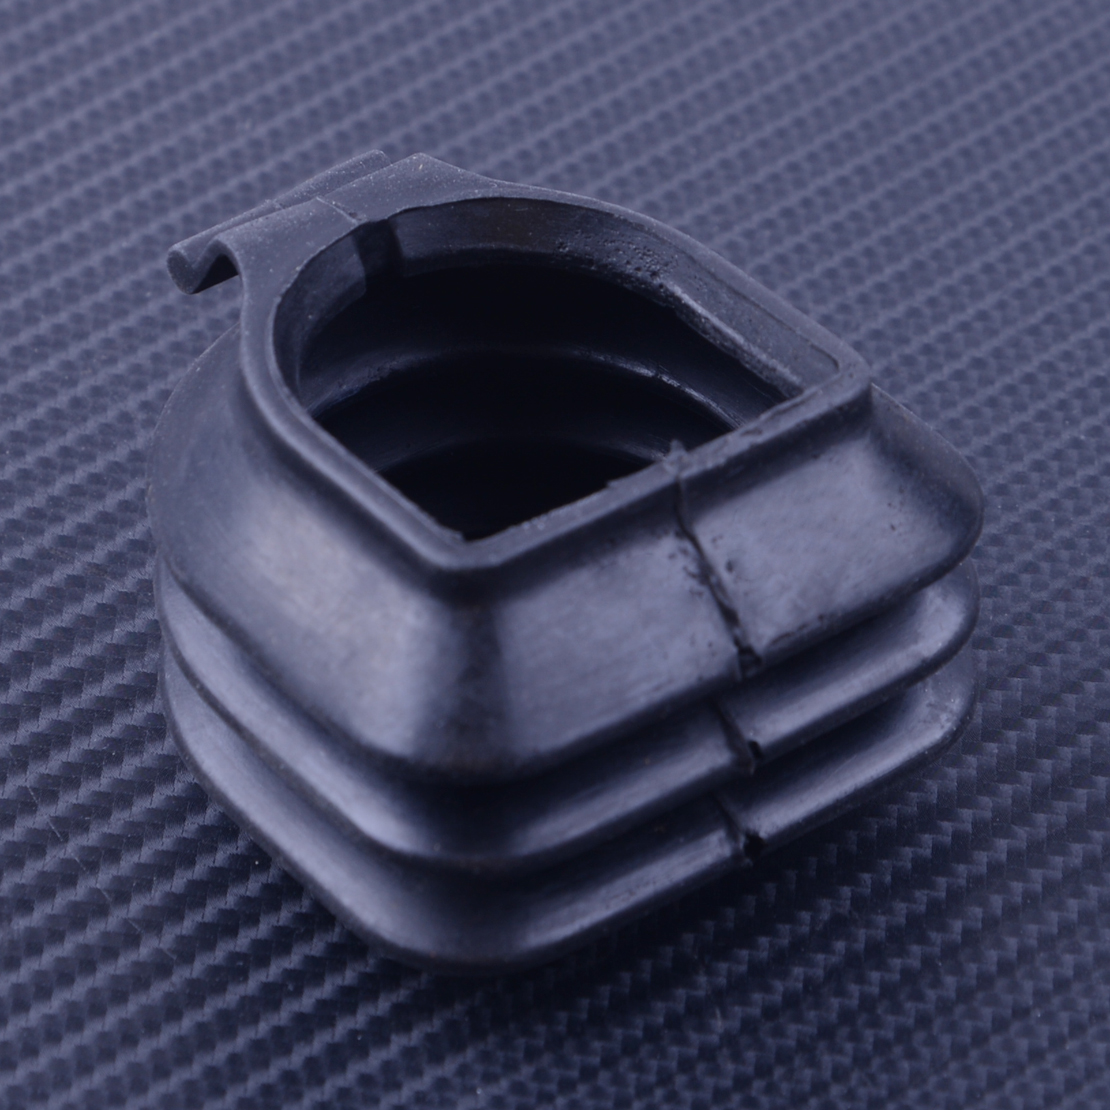 Коробка передач рычаг выбора вала защитный рукав загрузки 020301261 подходит для VW Cabriolet Jetta Golf Mk1 Mk2 title=